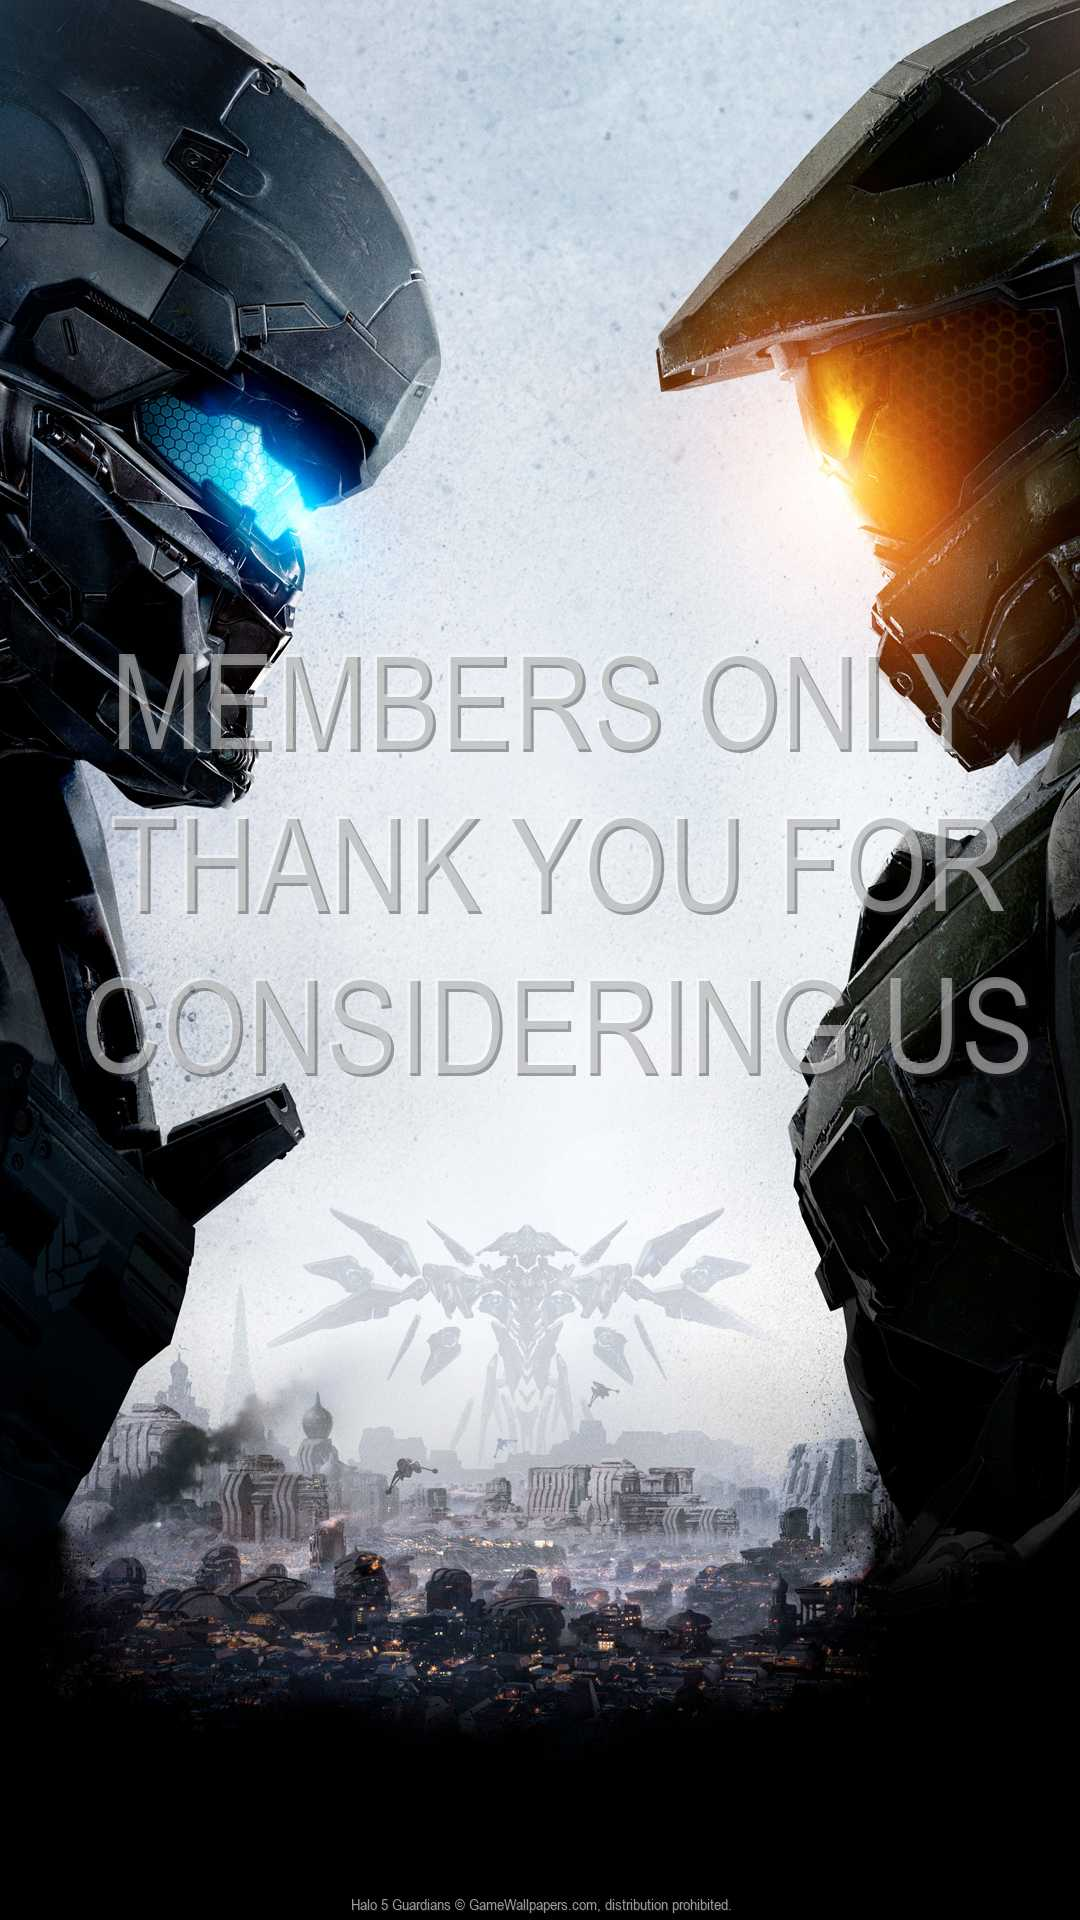 Halo 5: Guardians 1080p Vertical Handy Hintergrundbild 01